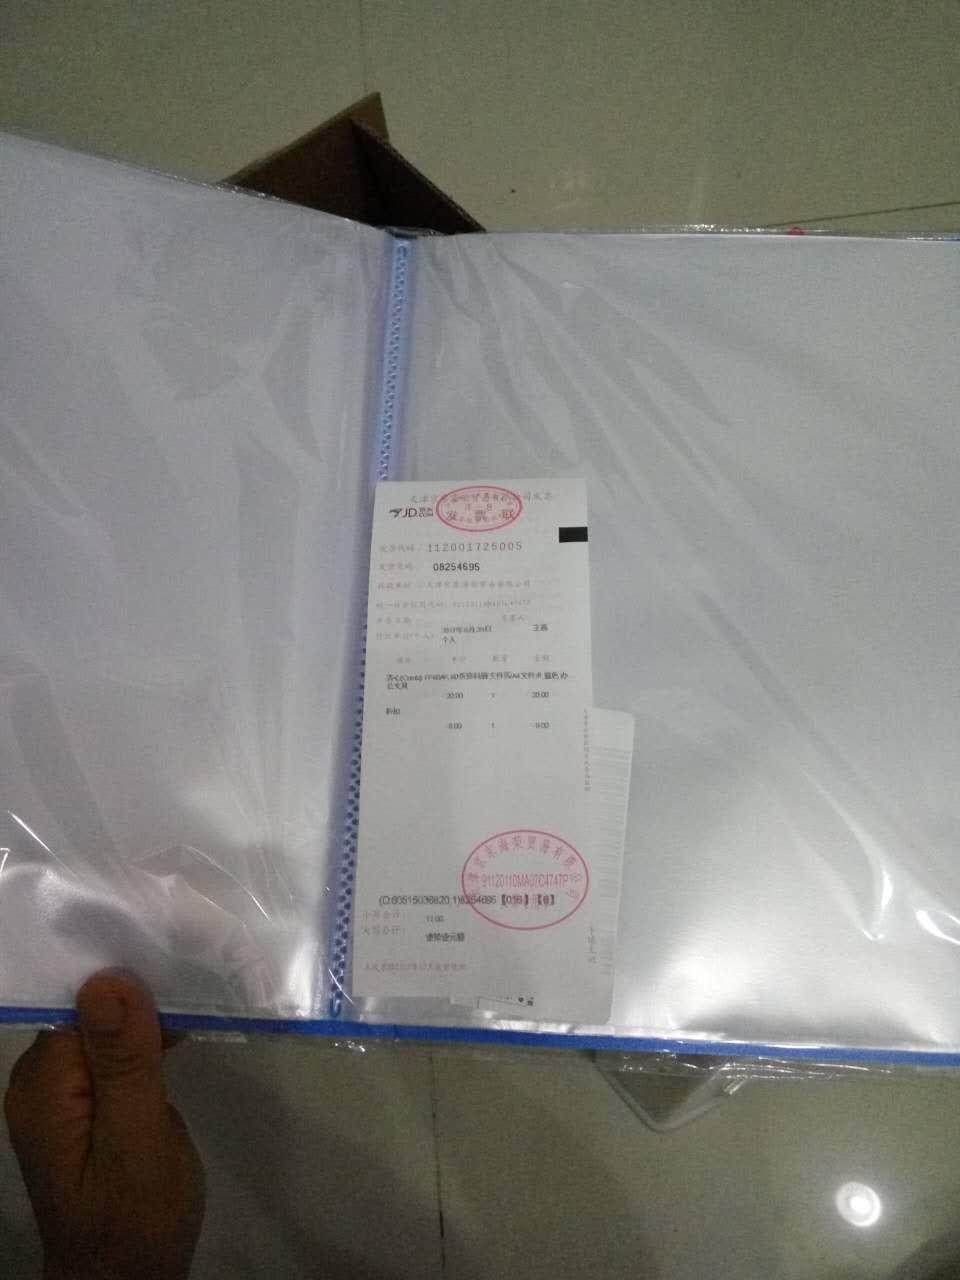 nike free tr fit 3 print nike id 00288869 cheap